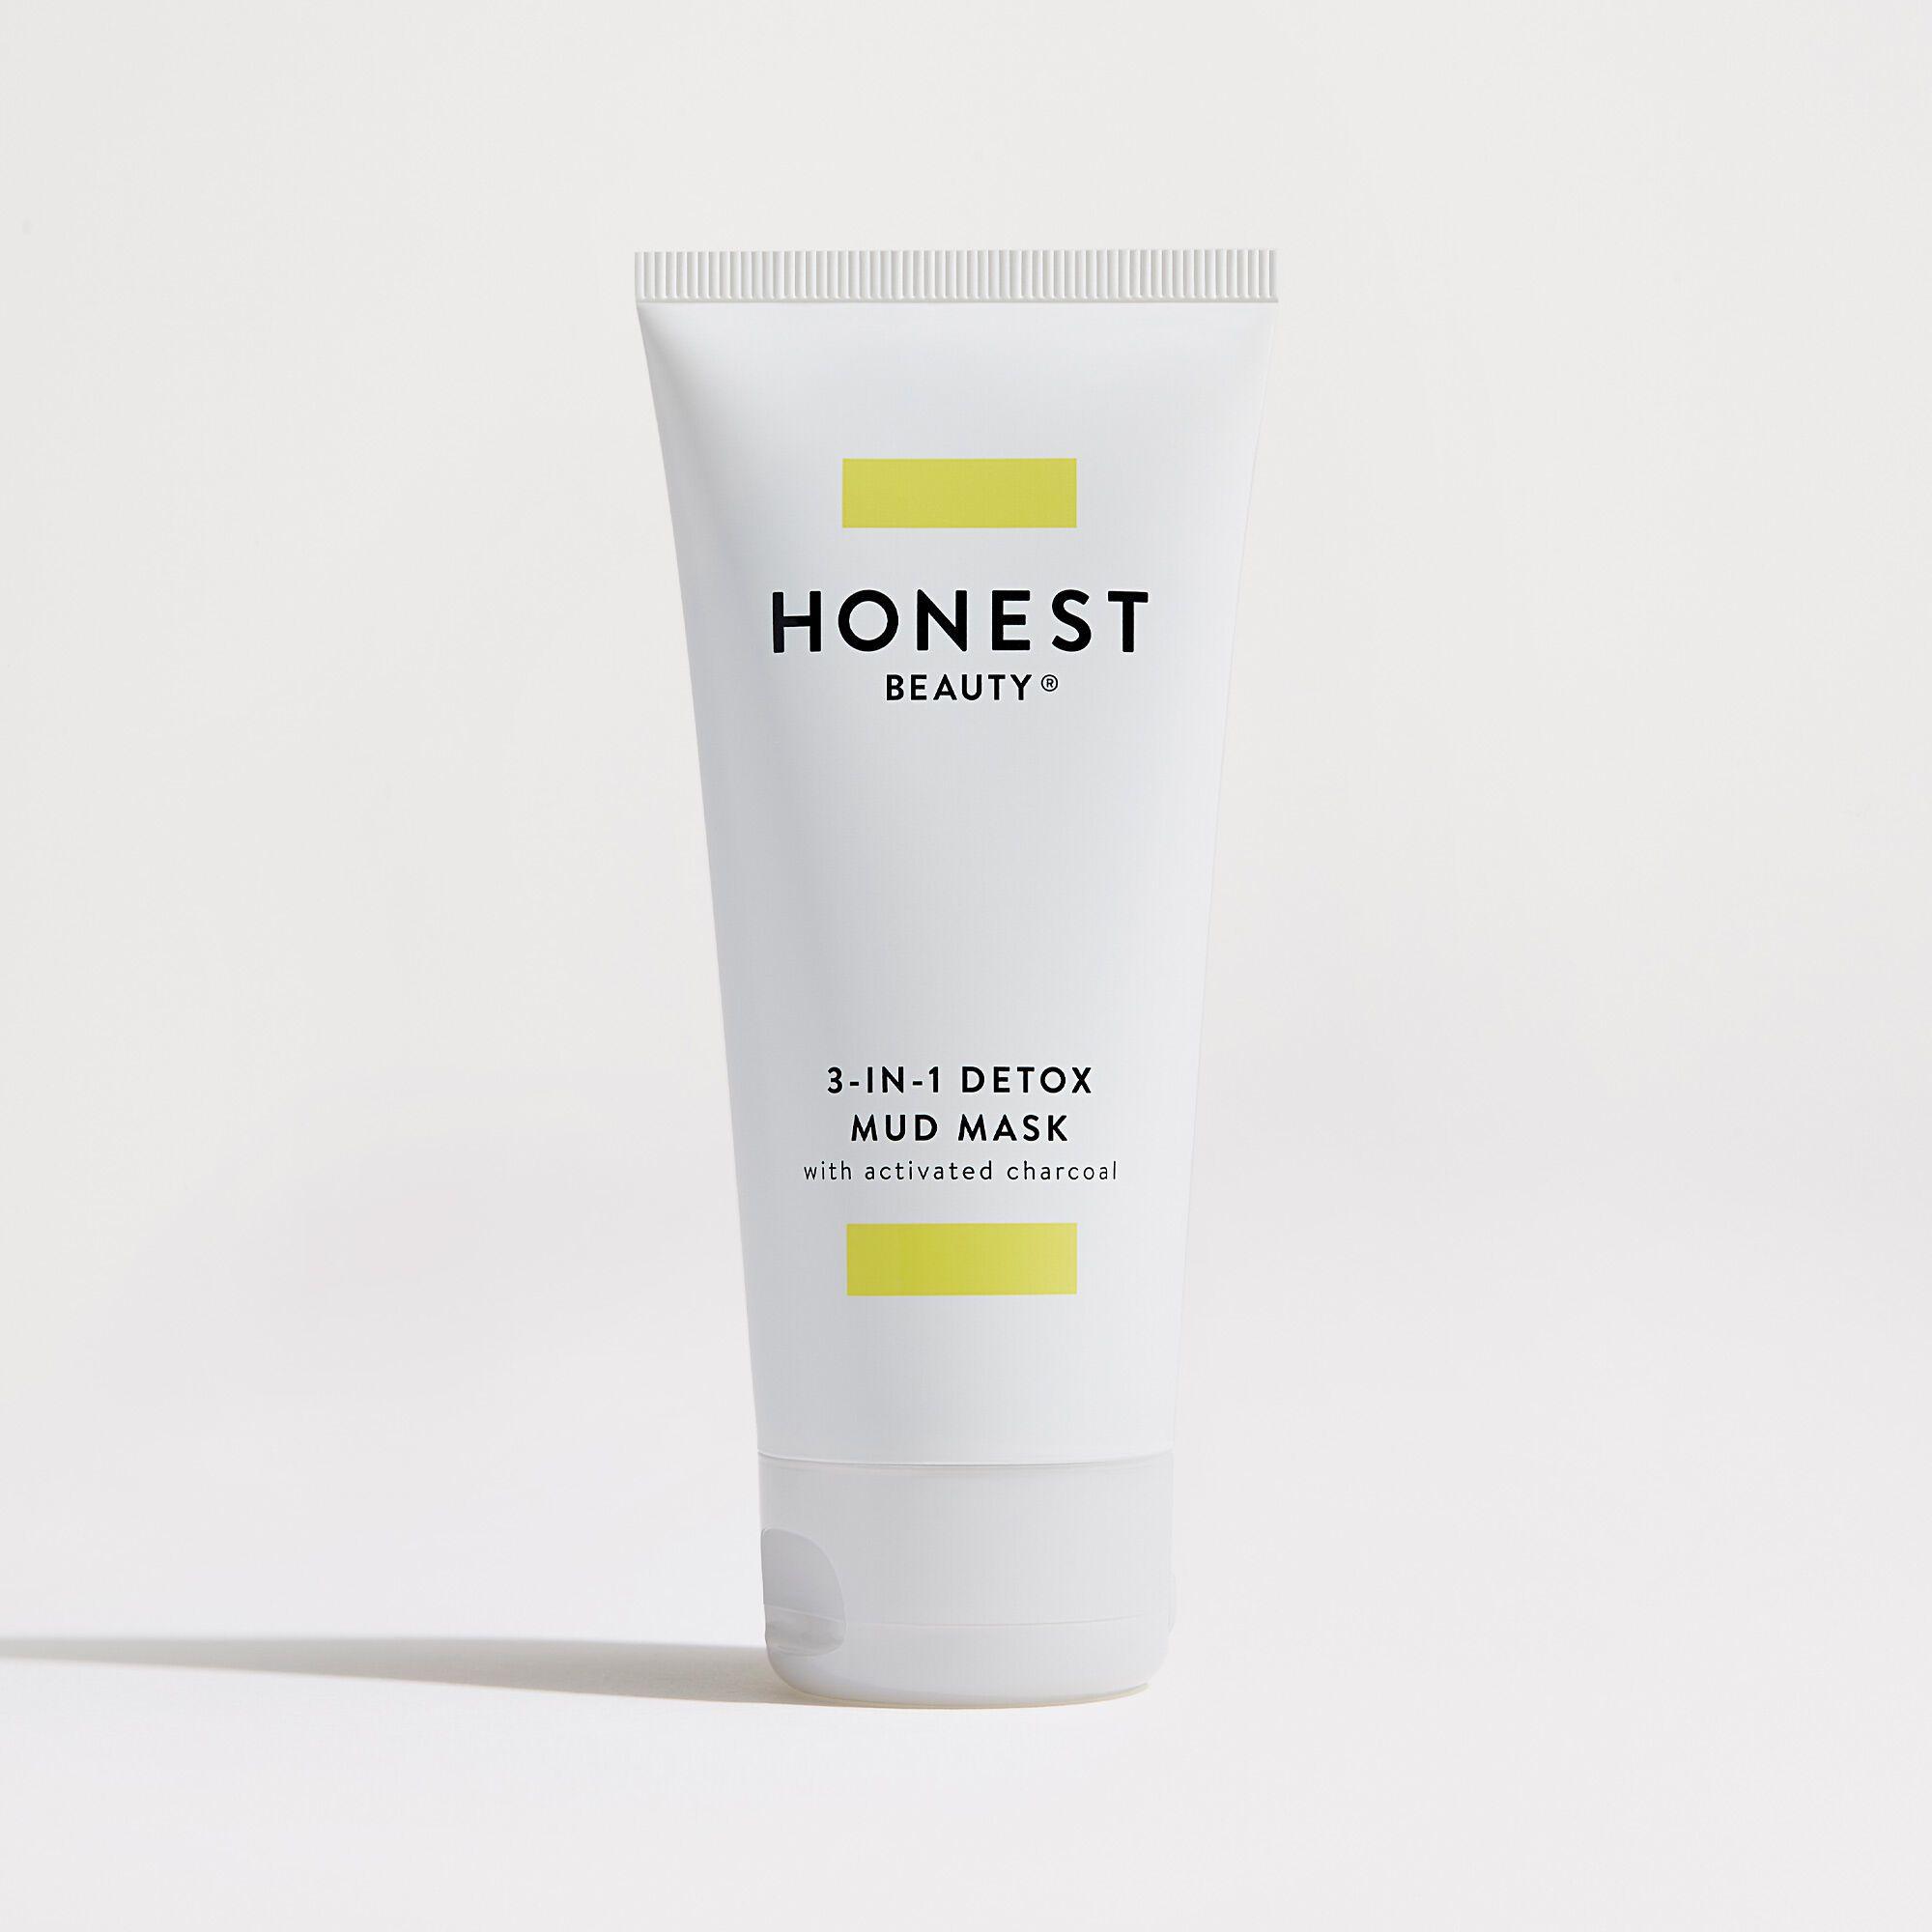 Honest Beauty Mud Mask